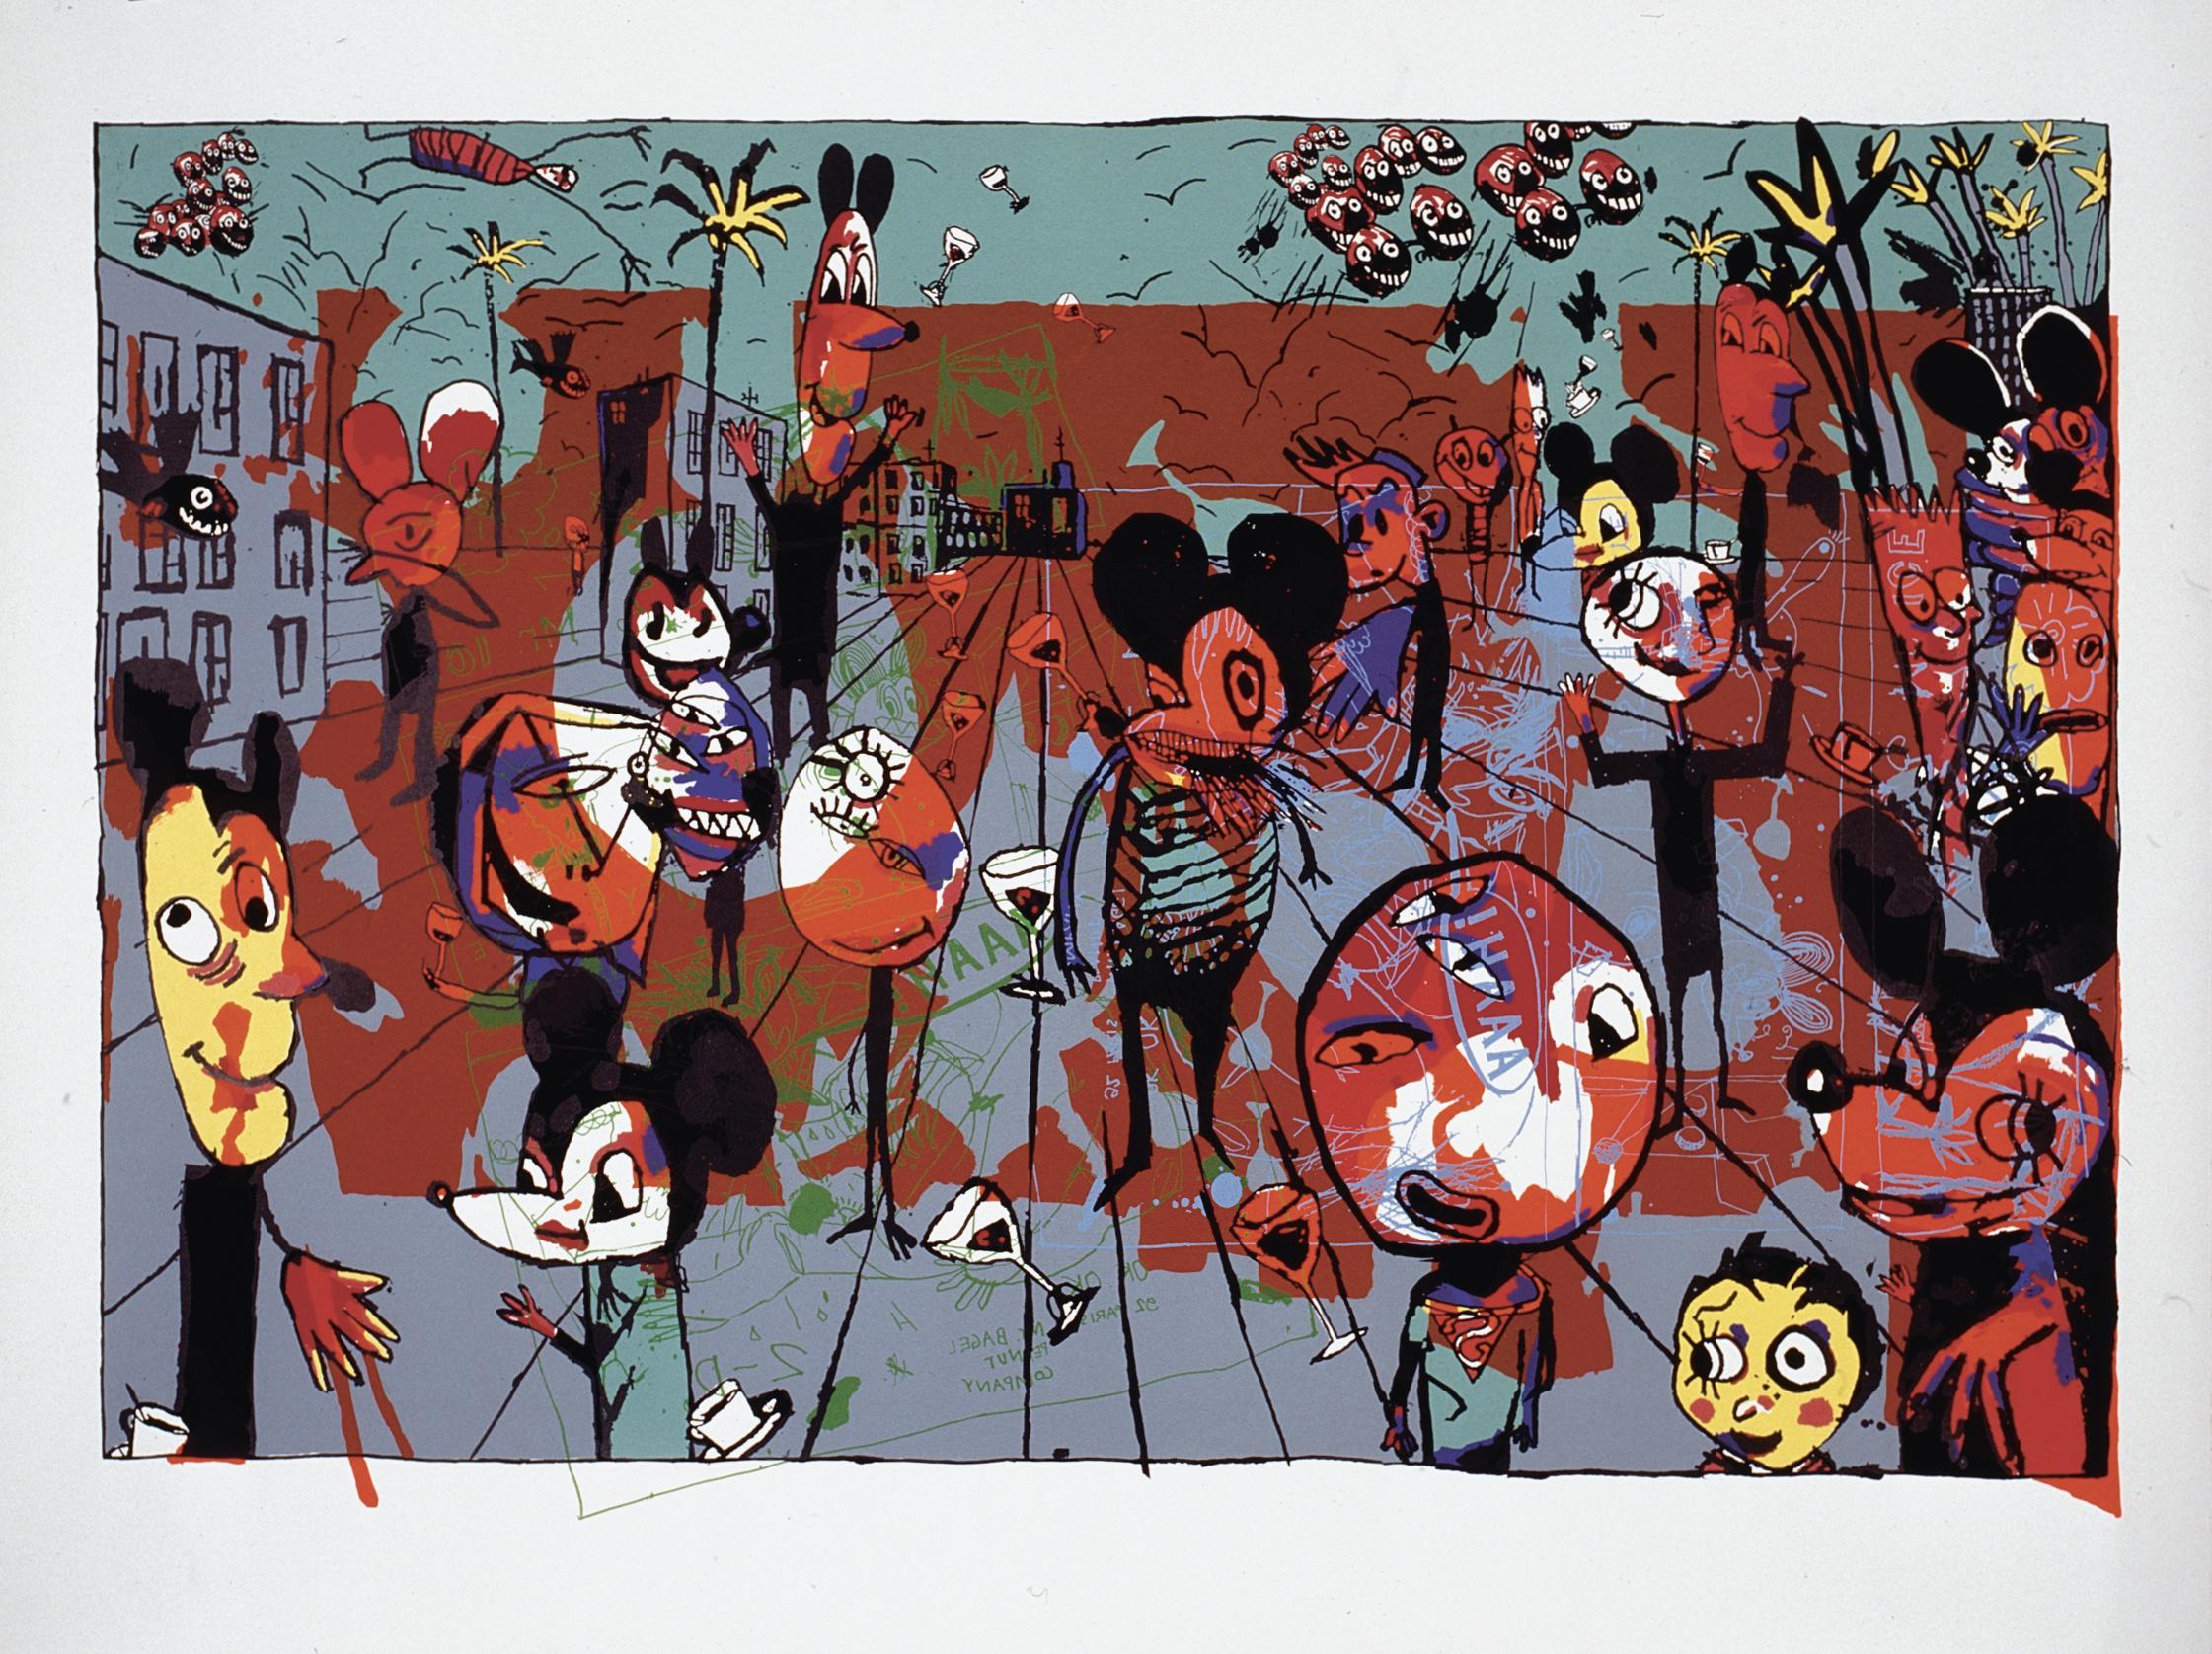 M.S. Bastian / Isabelle L., «Bastian World», 1994, Siebdruck © M.S. Bastian / Isabelle L.